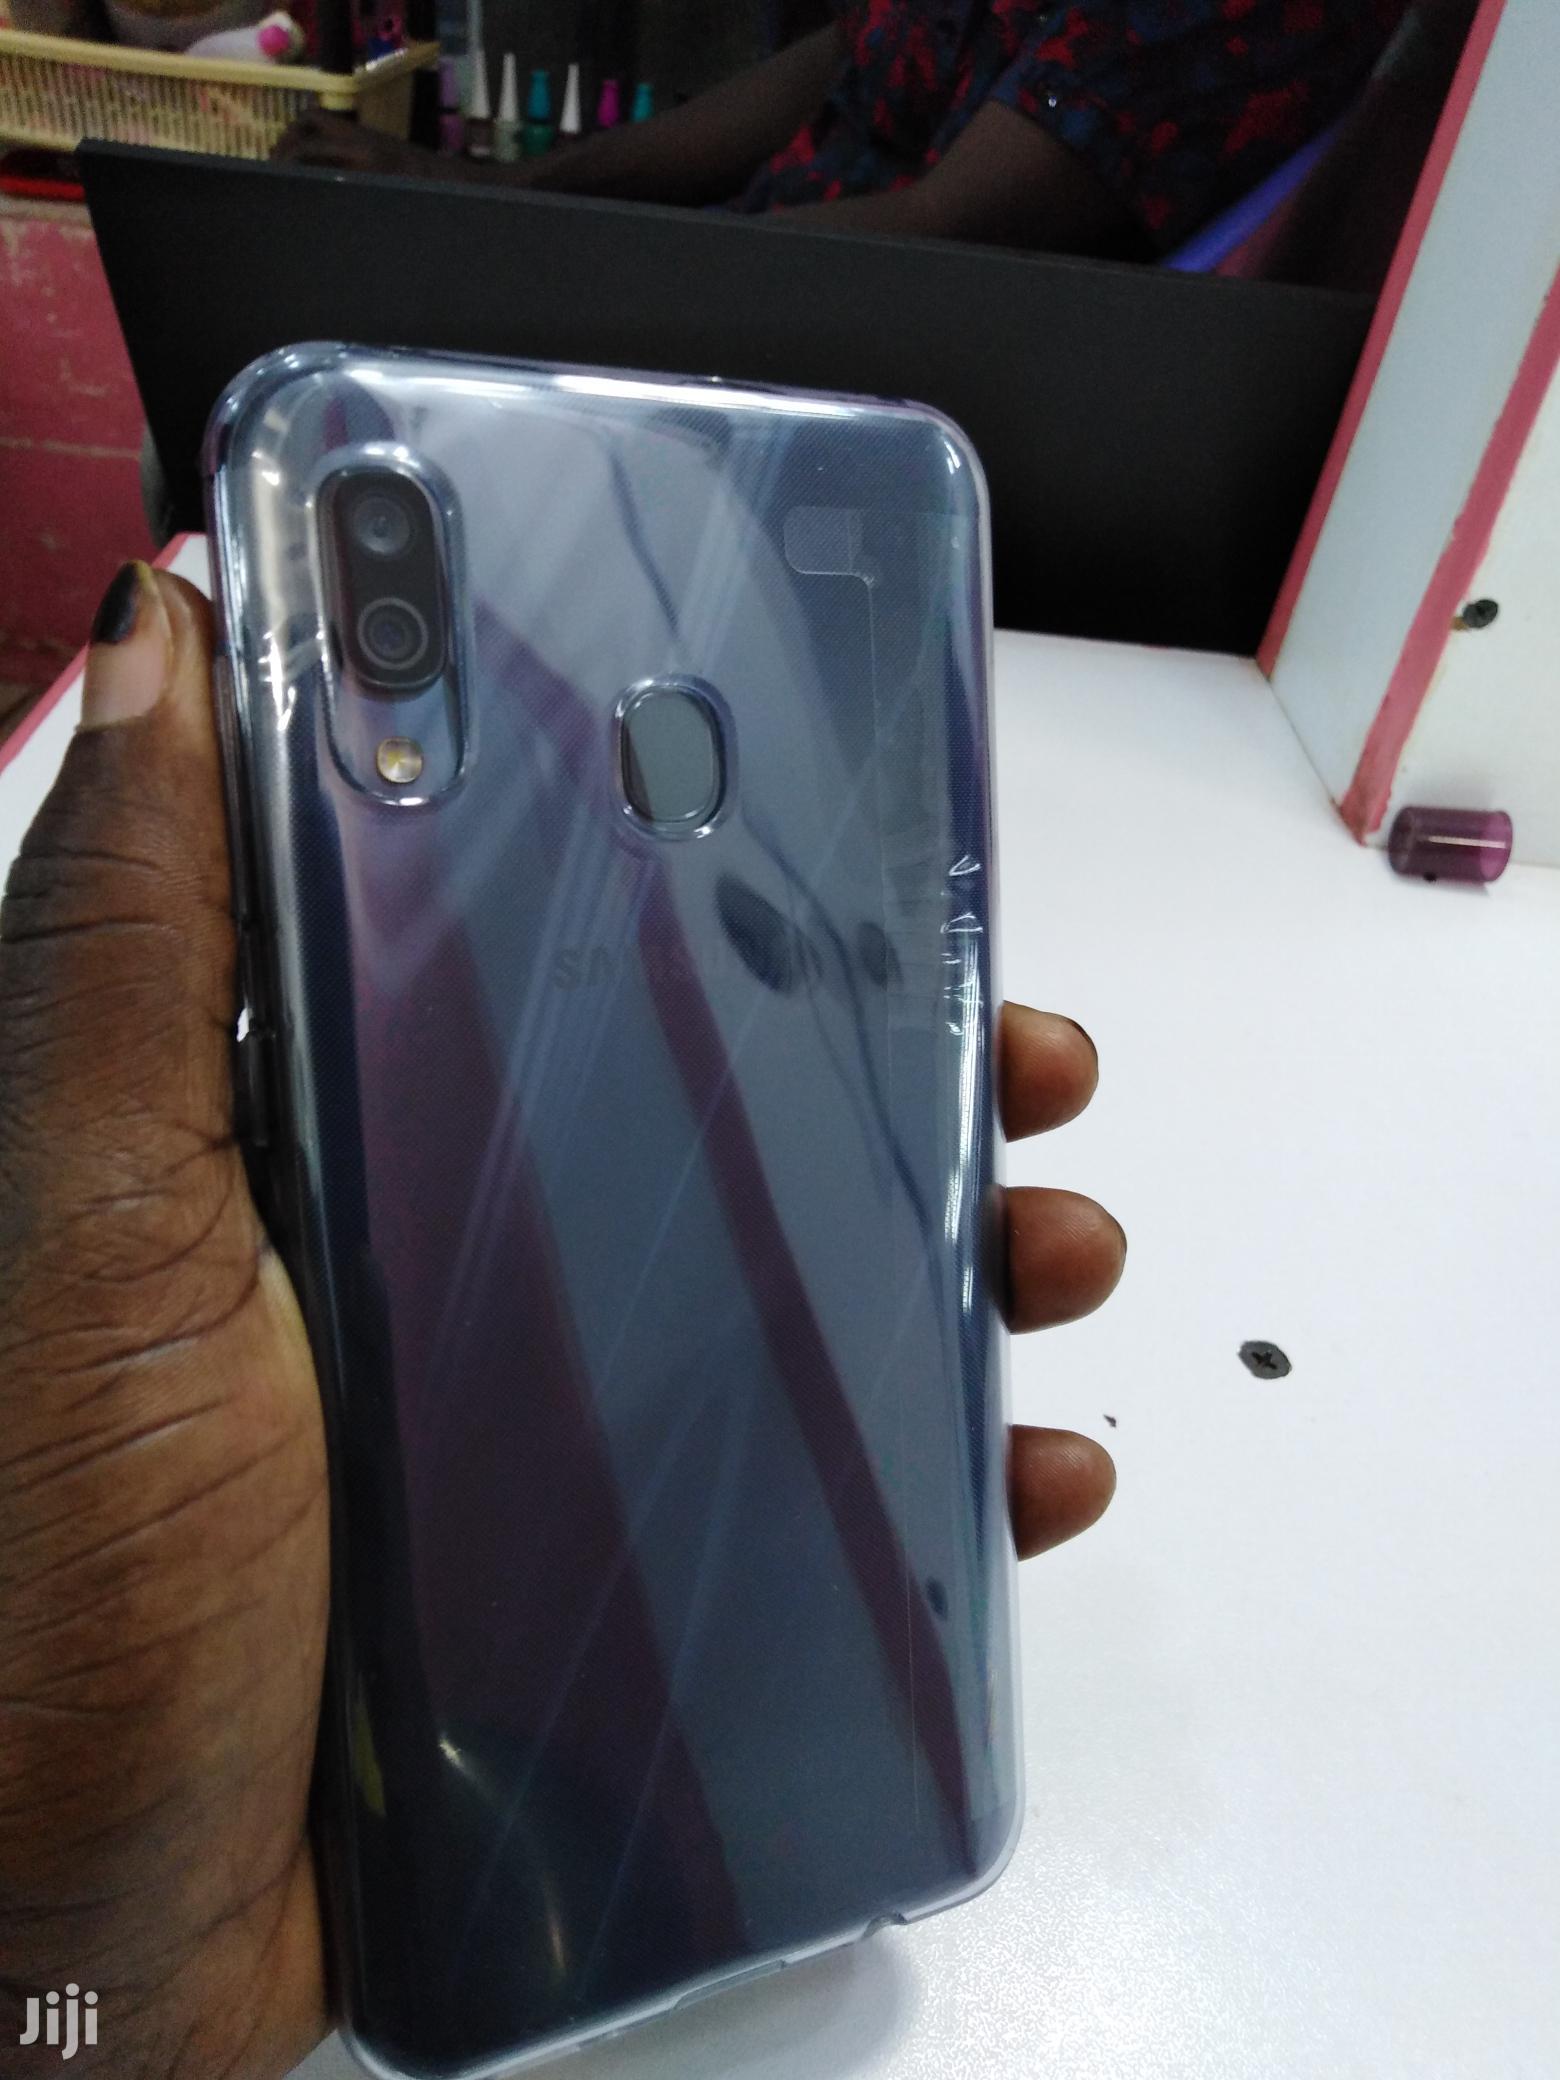 New Samsung Galaxy A30 64 GB | Mobile Phones for sale in Kampala, Central Region, Uganda